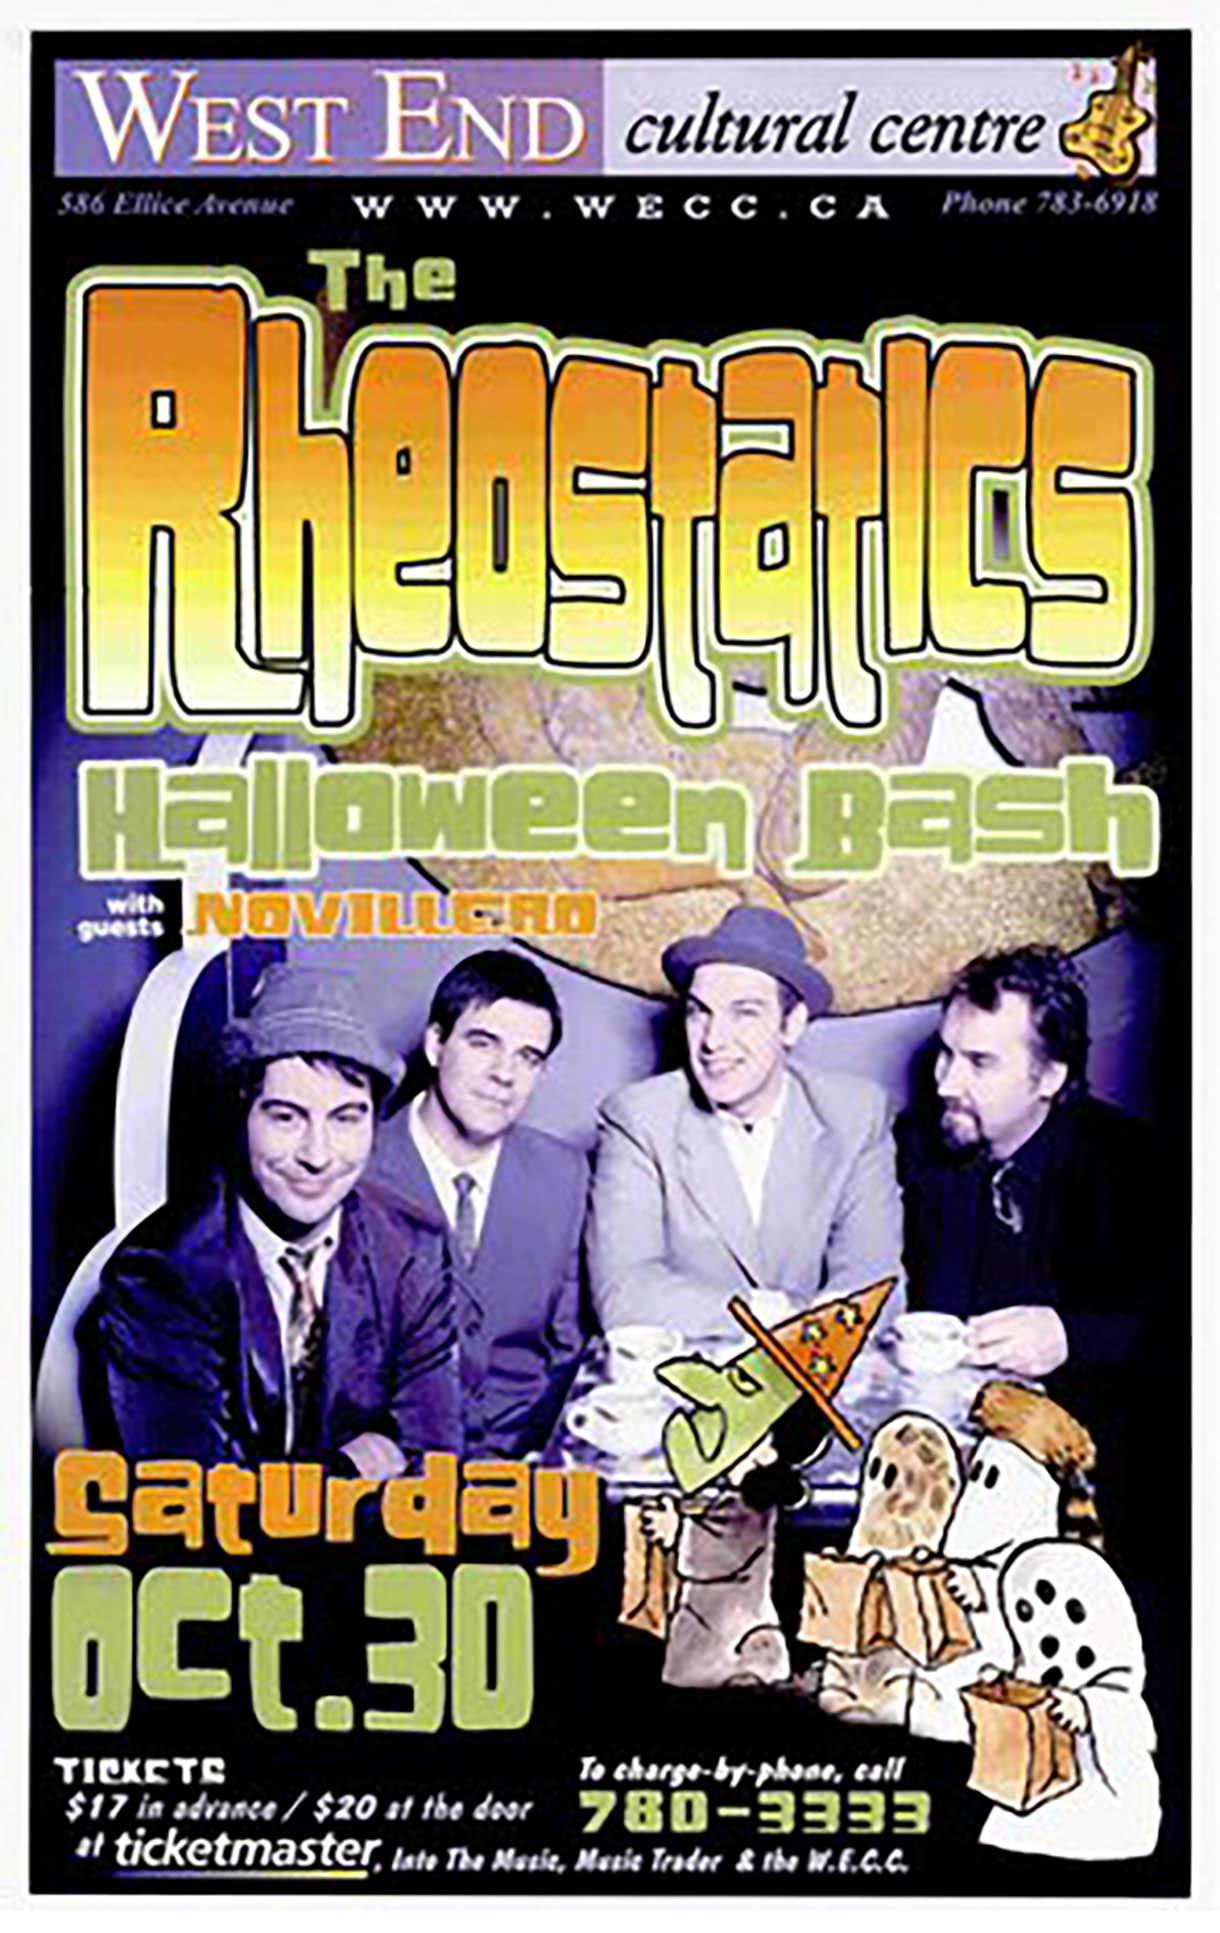 RHEOSTATICS – 2004